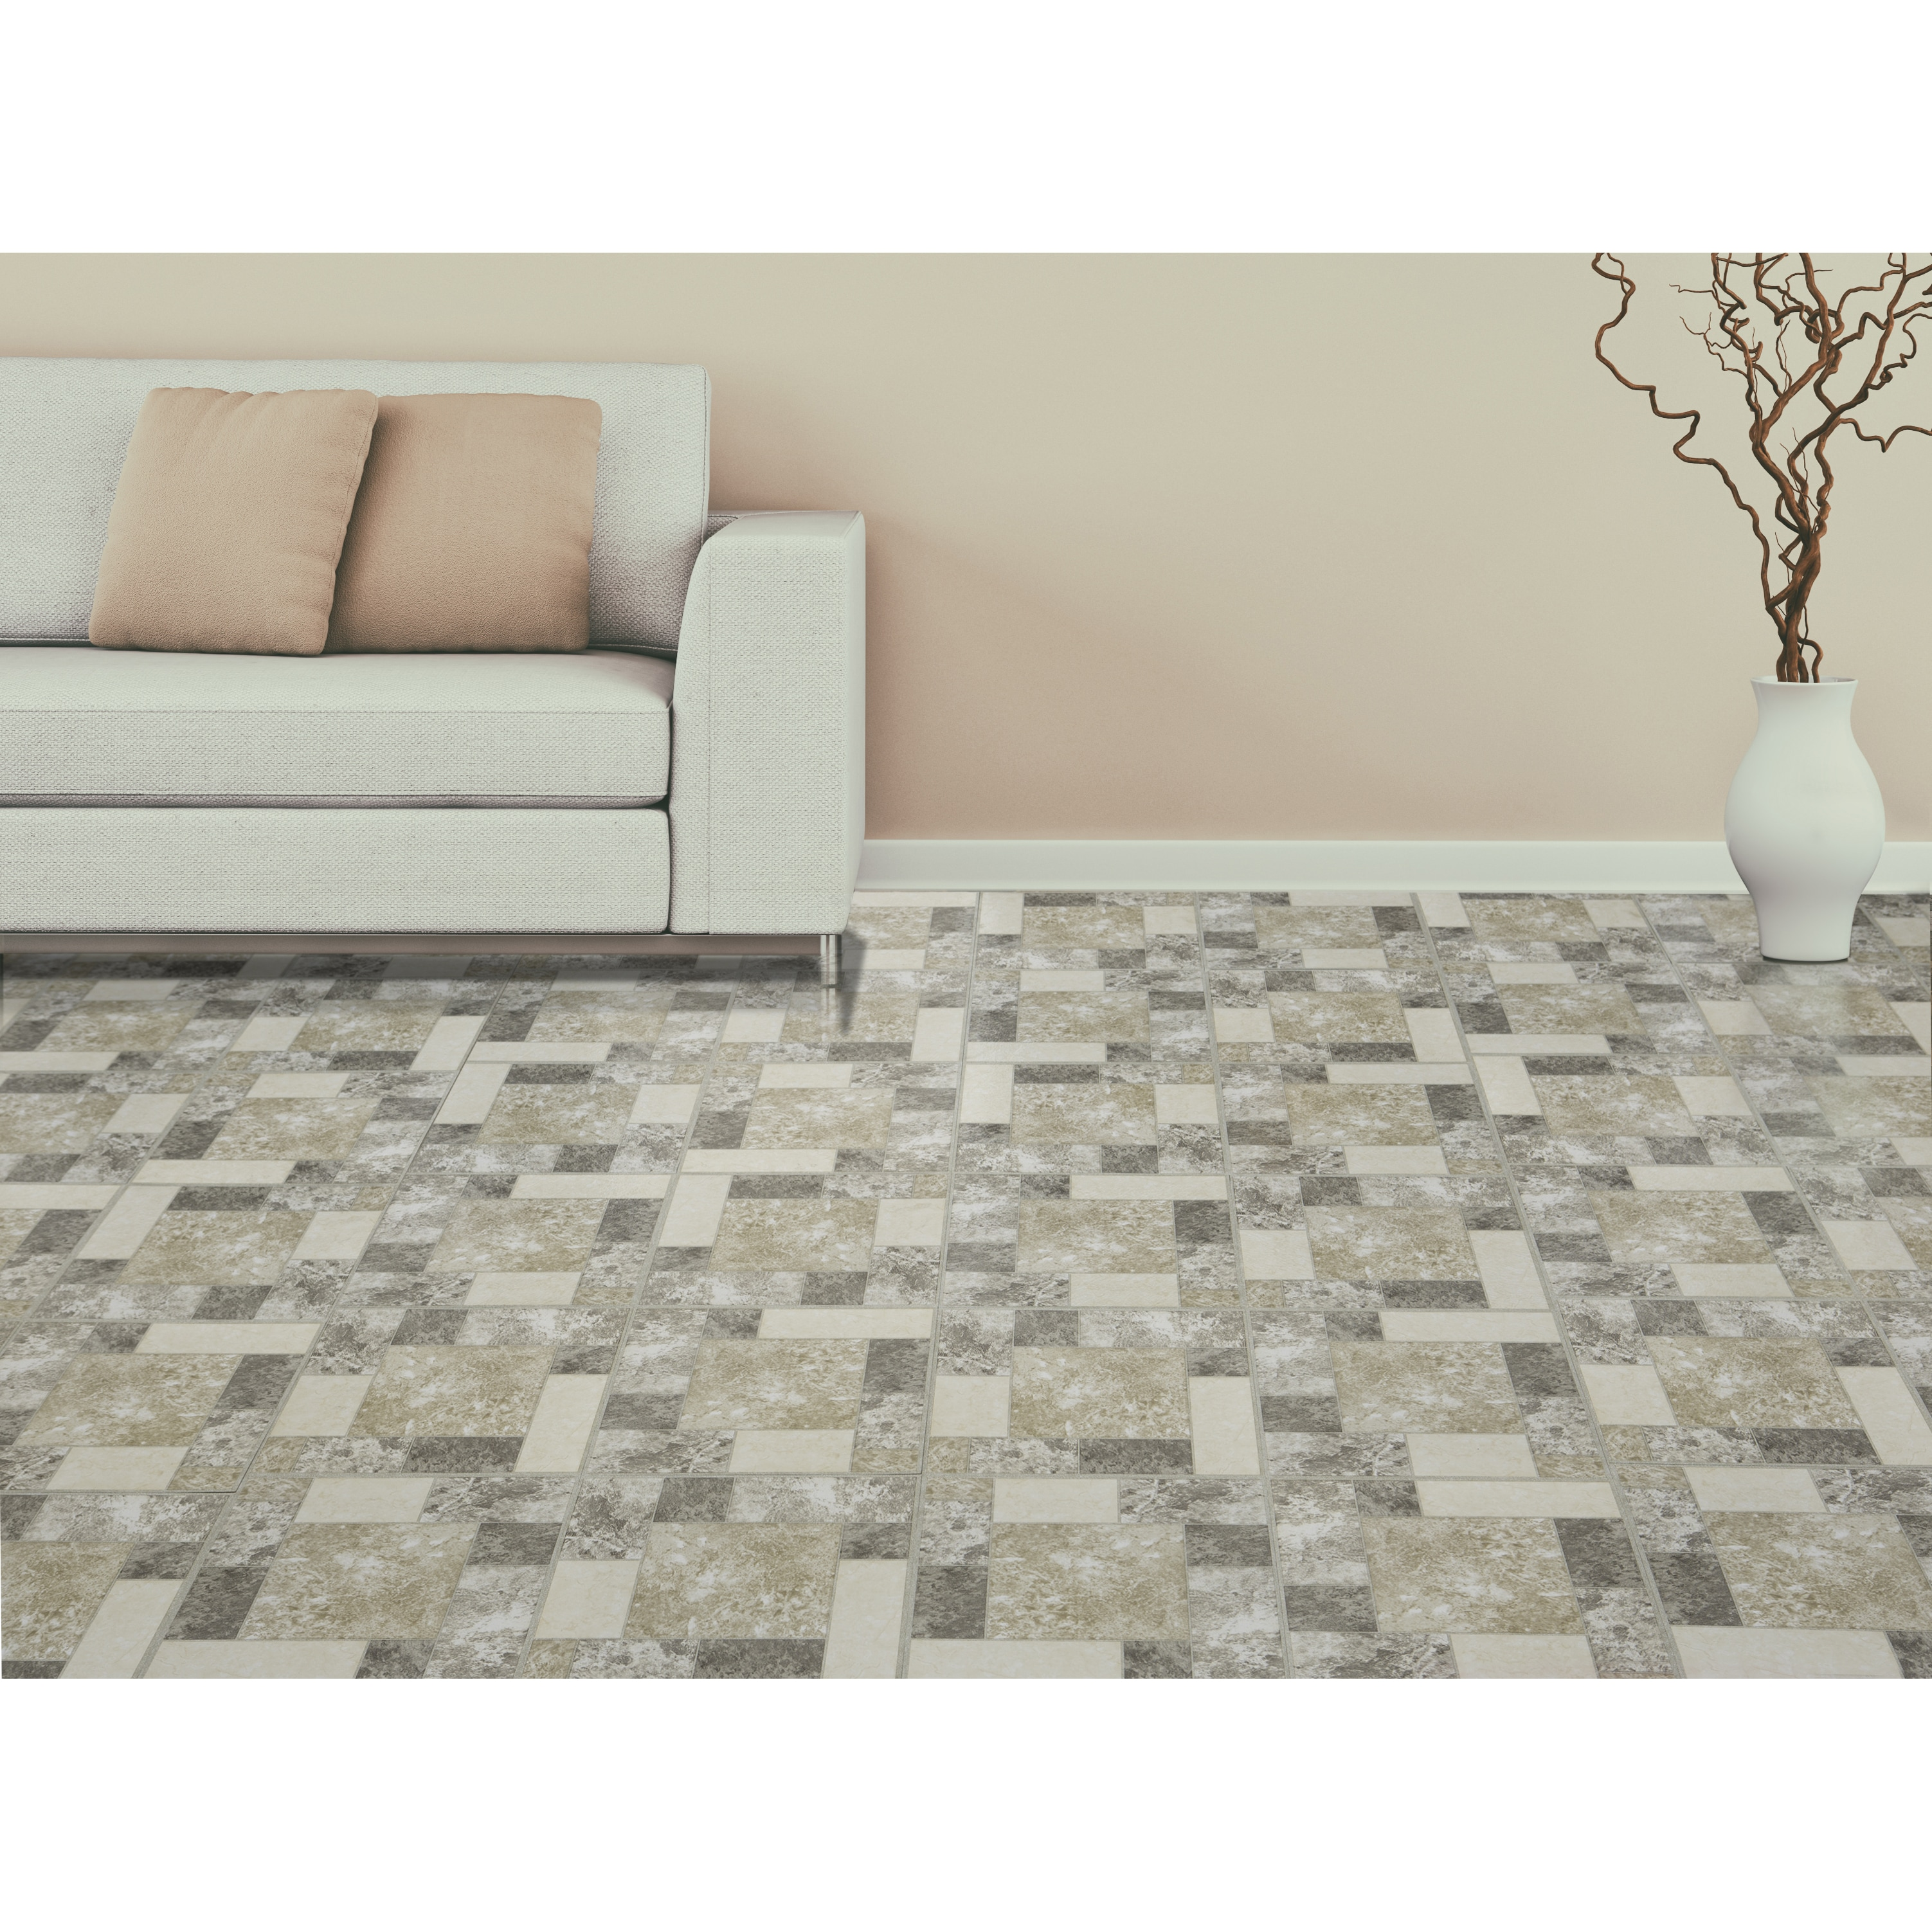 Shop Achim Tivoli Marble Blocks 12x12 Self Adhesive Vinyl Floor Tile